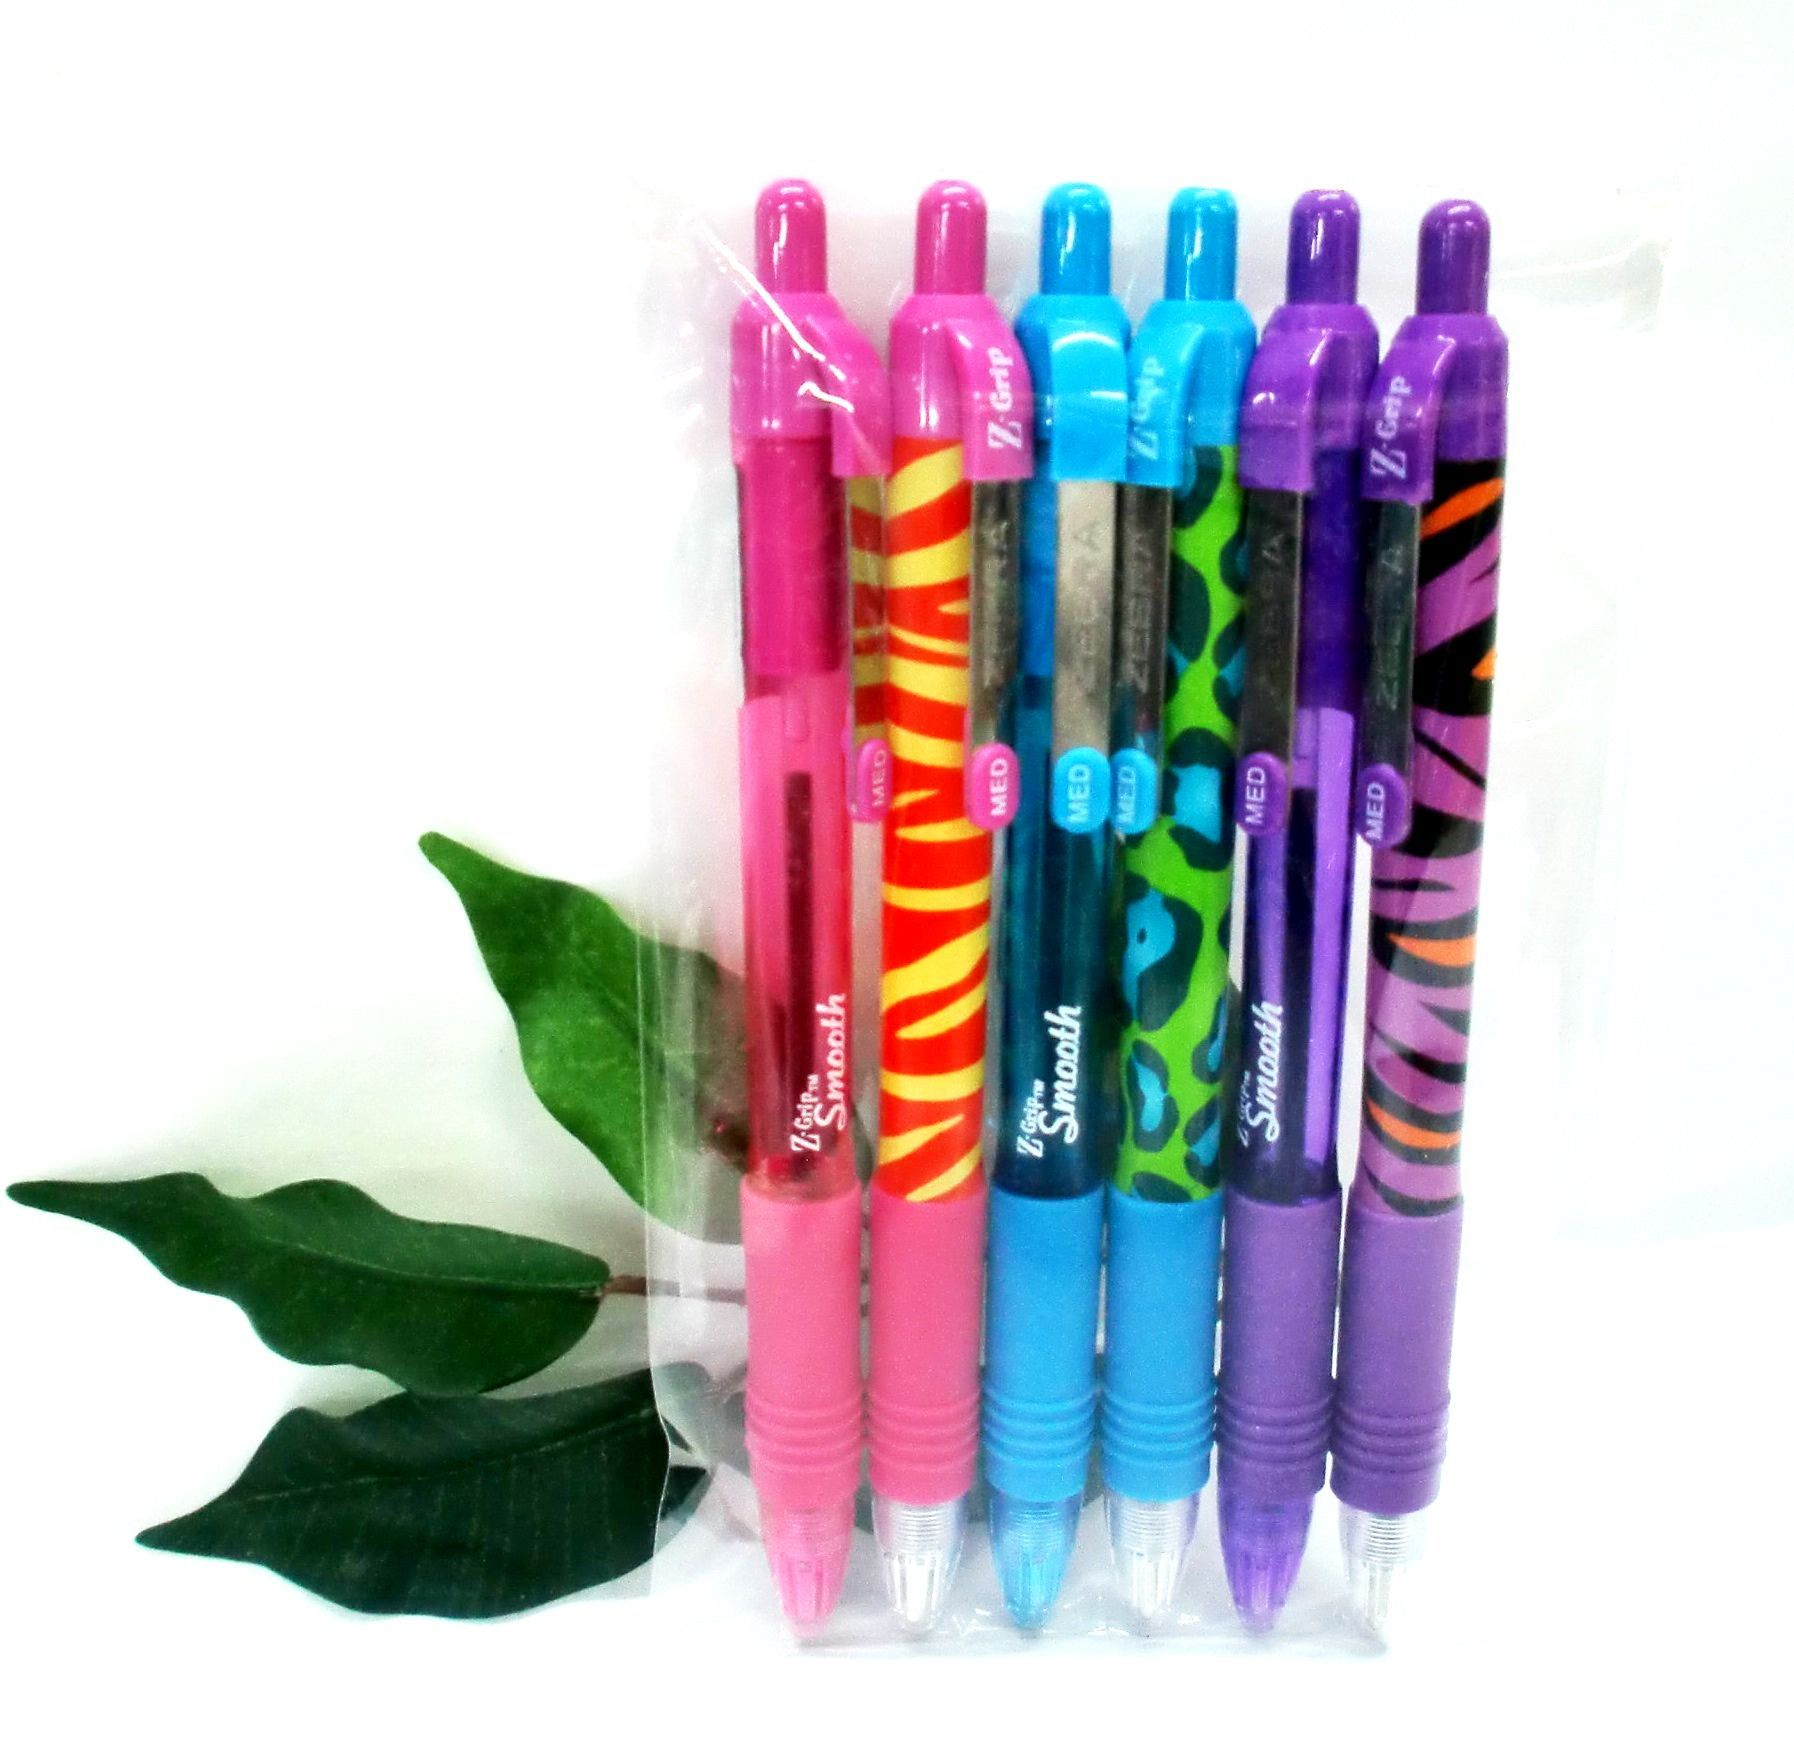 6 x Zebra Z-Grip Funky Brights Assorted Ink Animal Pattern Ballpoint Pens